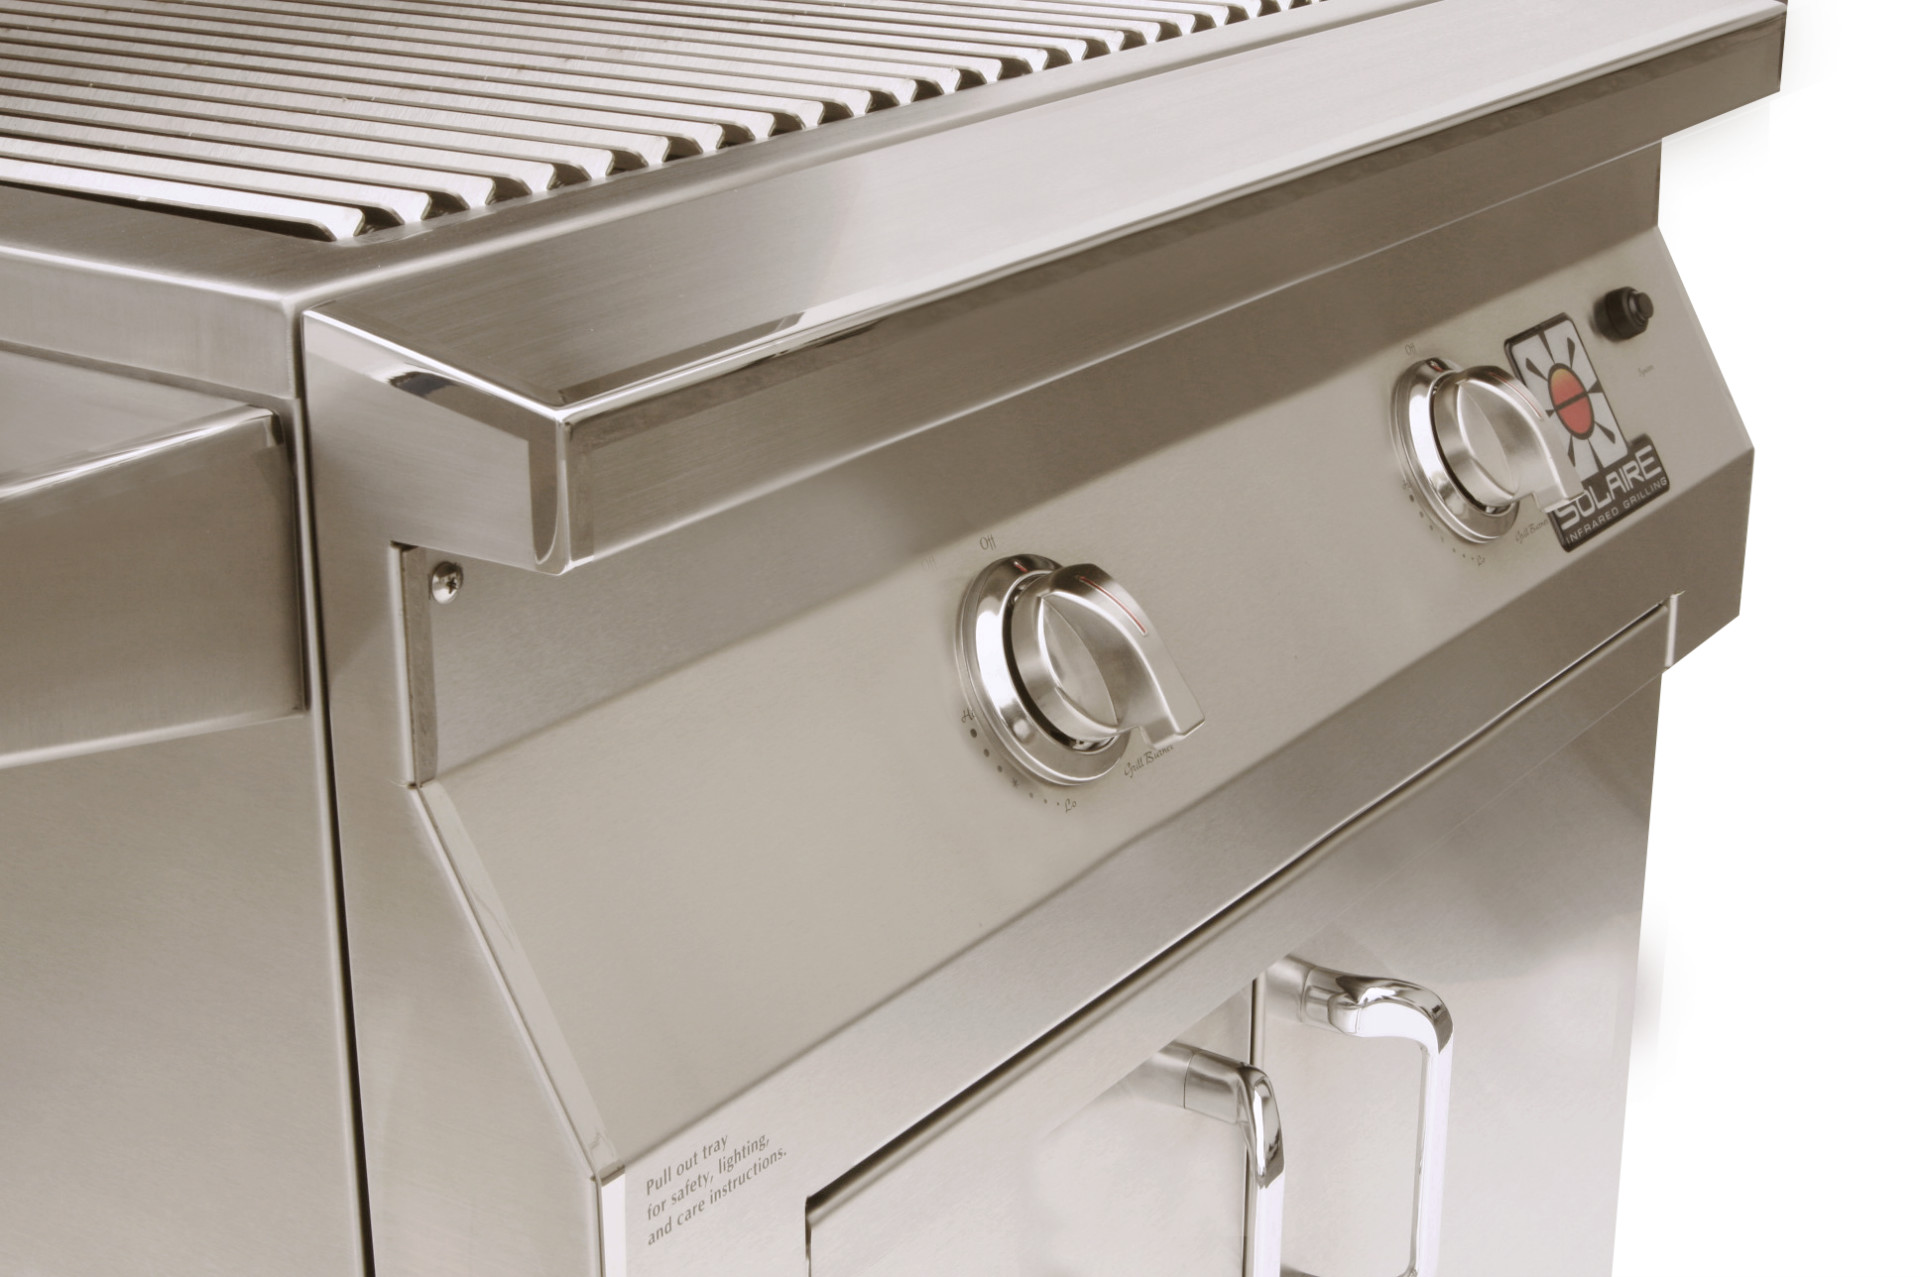 IRBQ-30C_lf_detail-bullnose-panel_1-r100-w1920